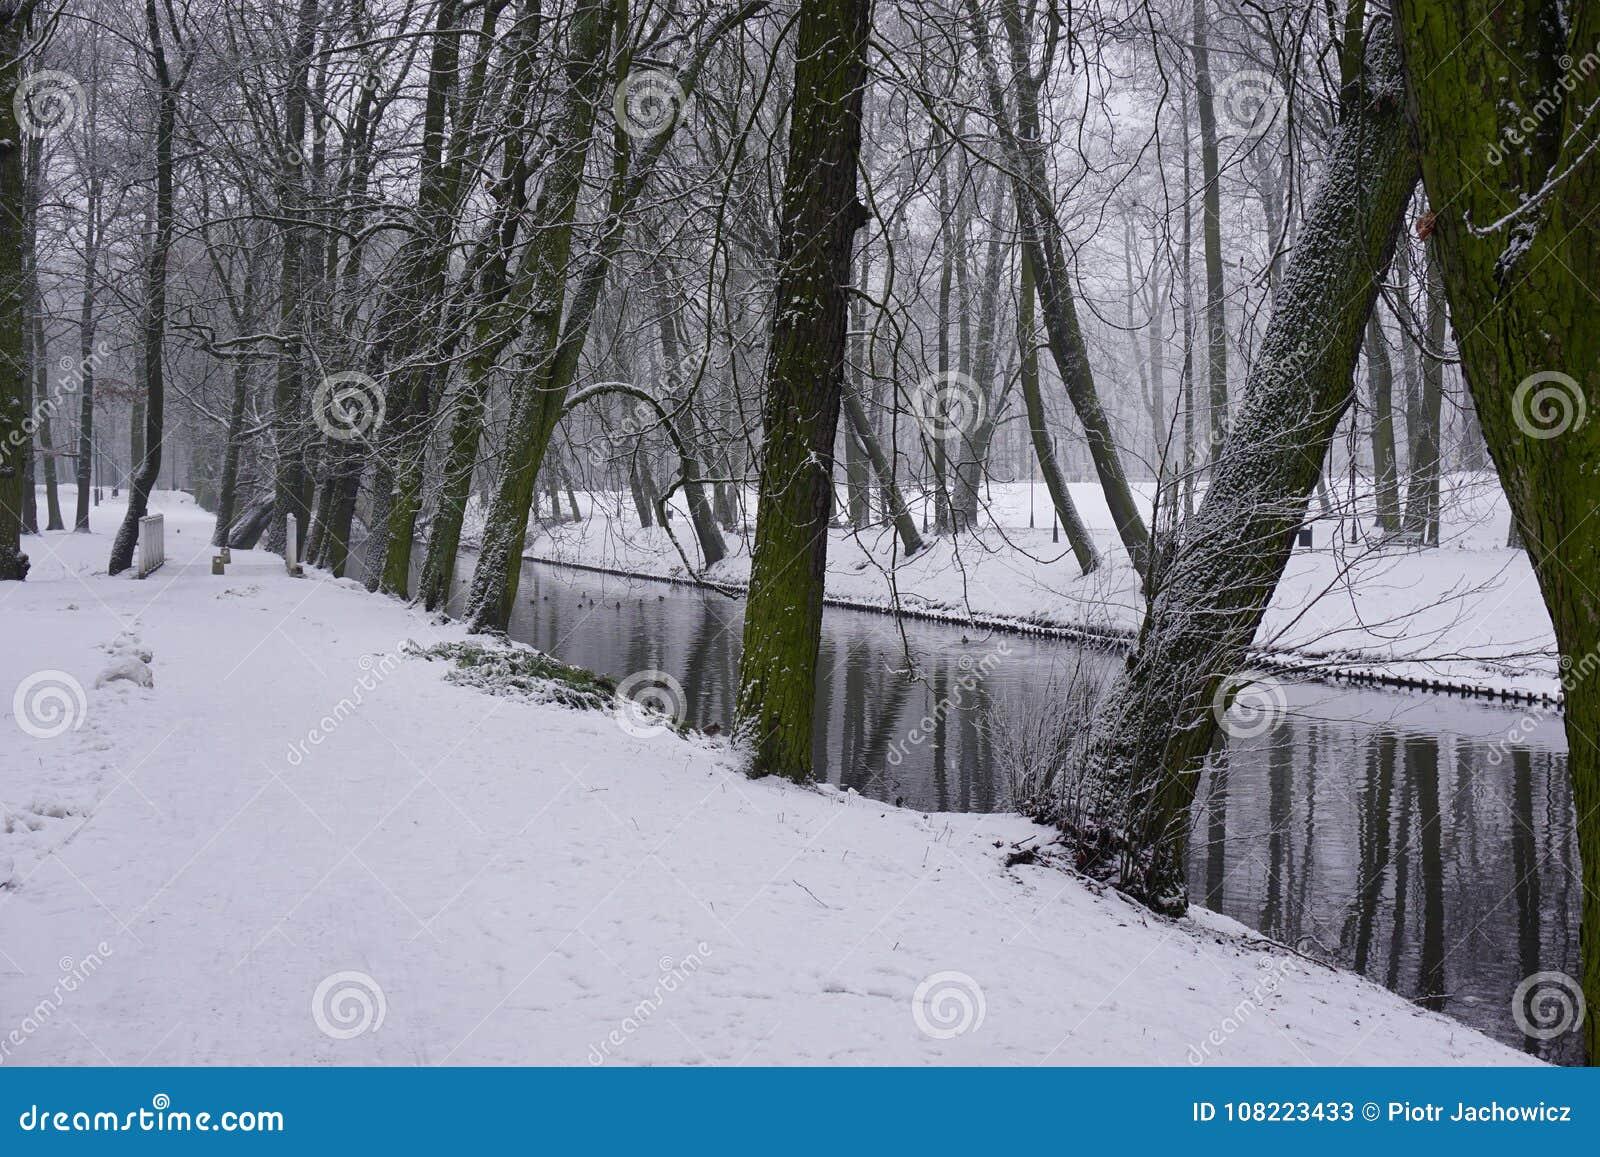 Winter in Park 9